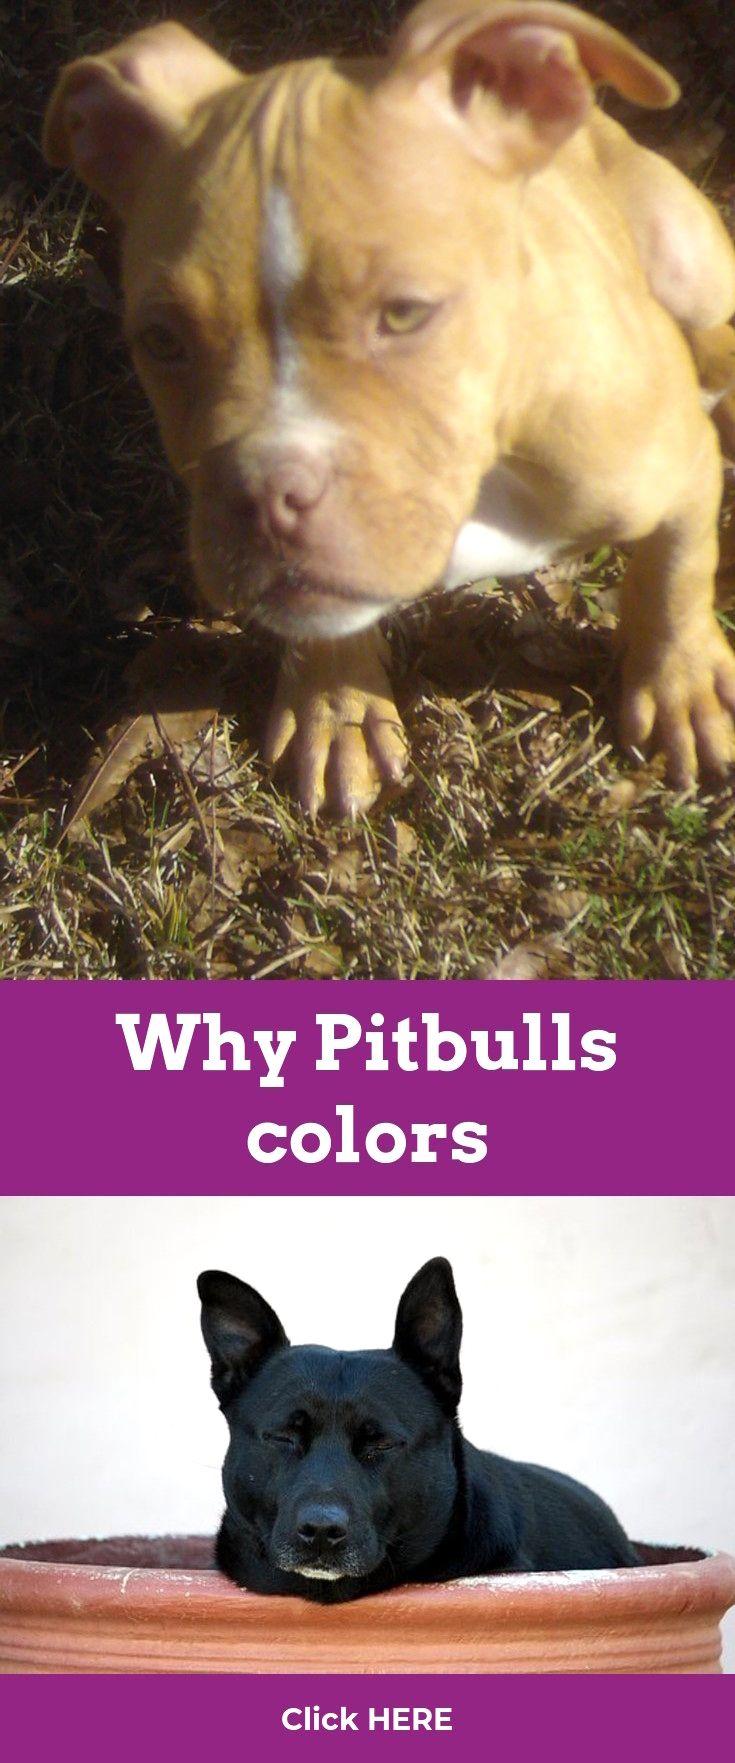 Pitbulls Red Nosed Pitbulls And Parolees Dvd Click Visit